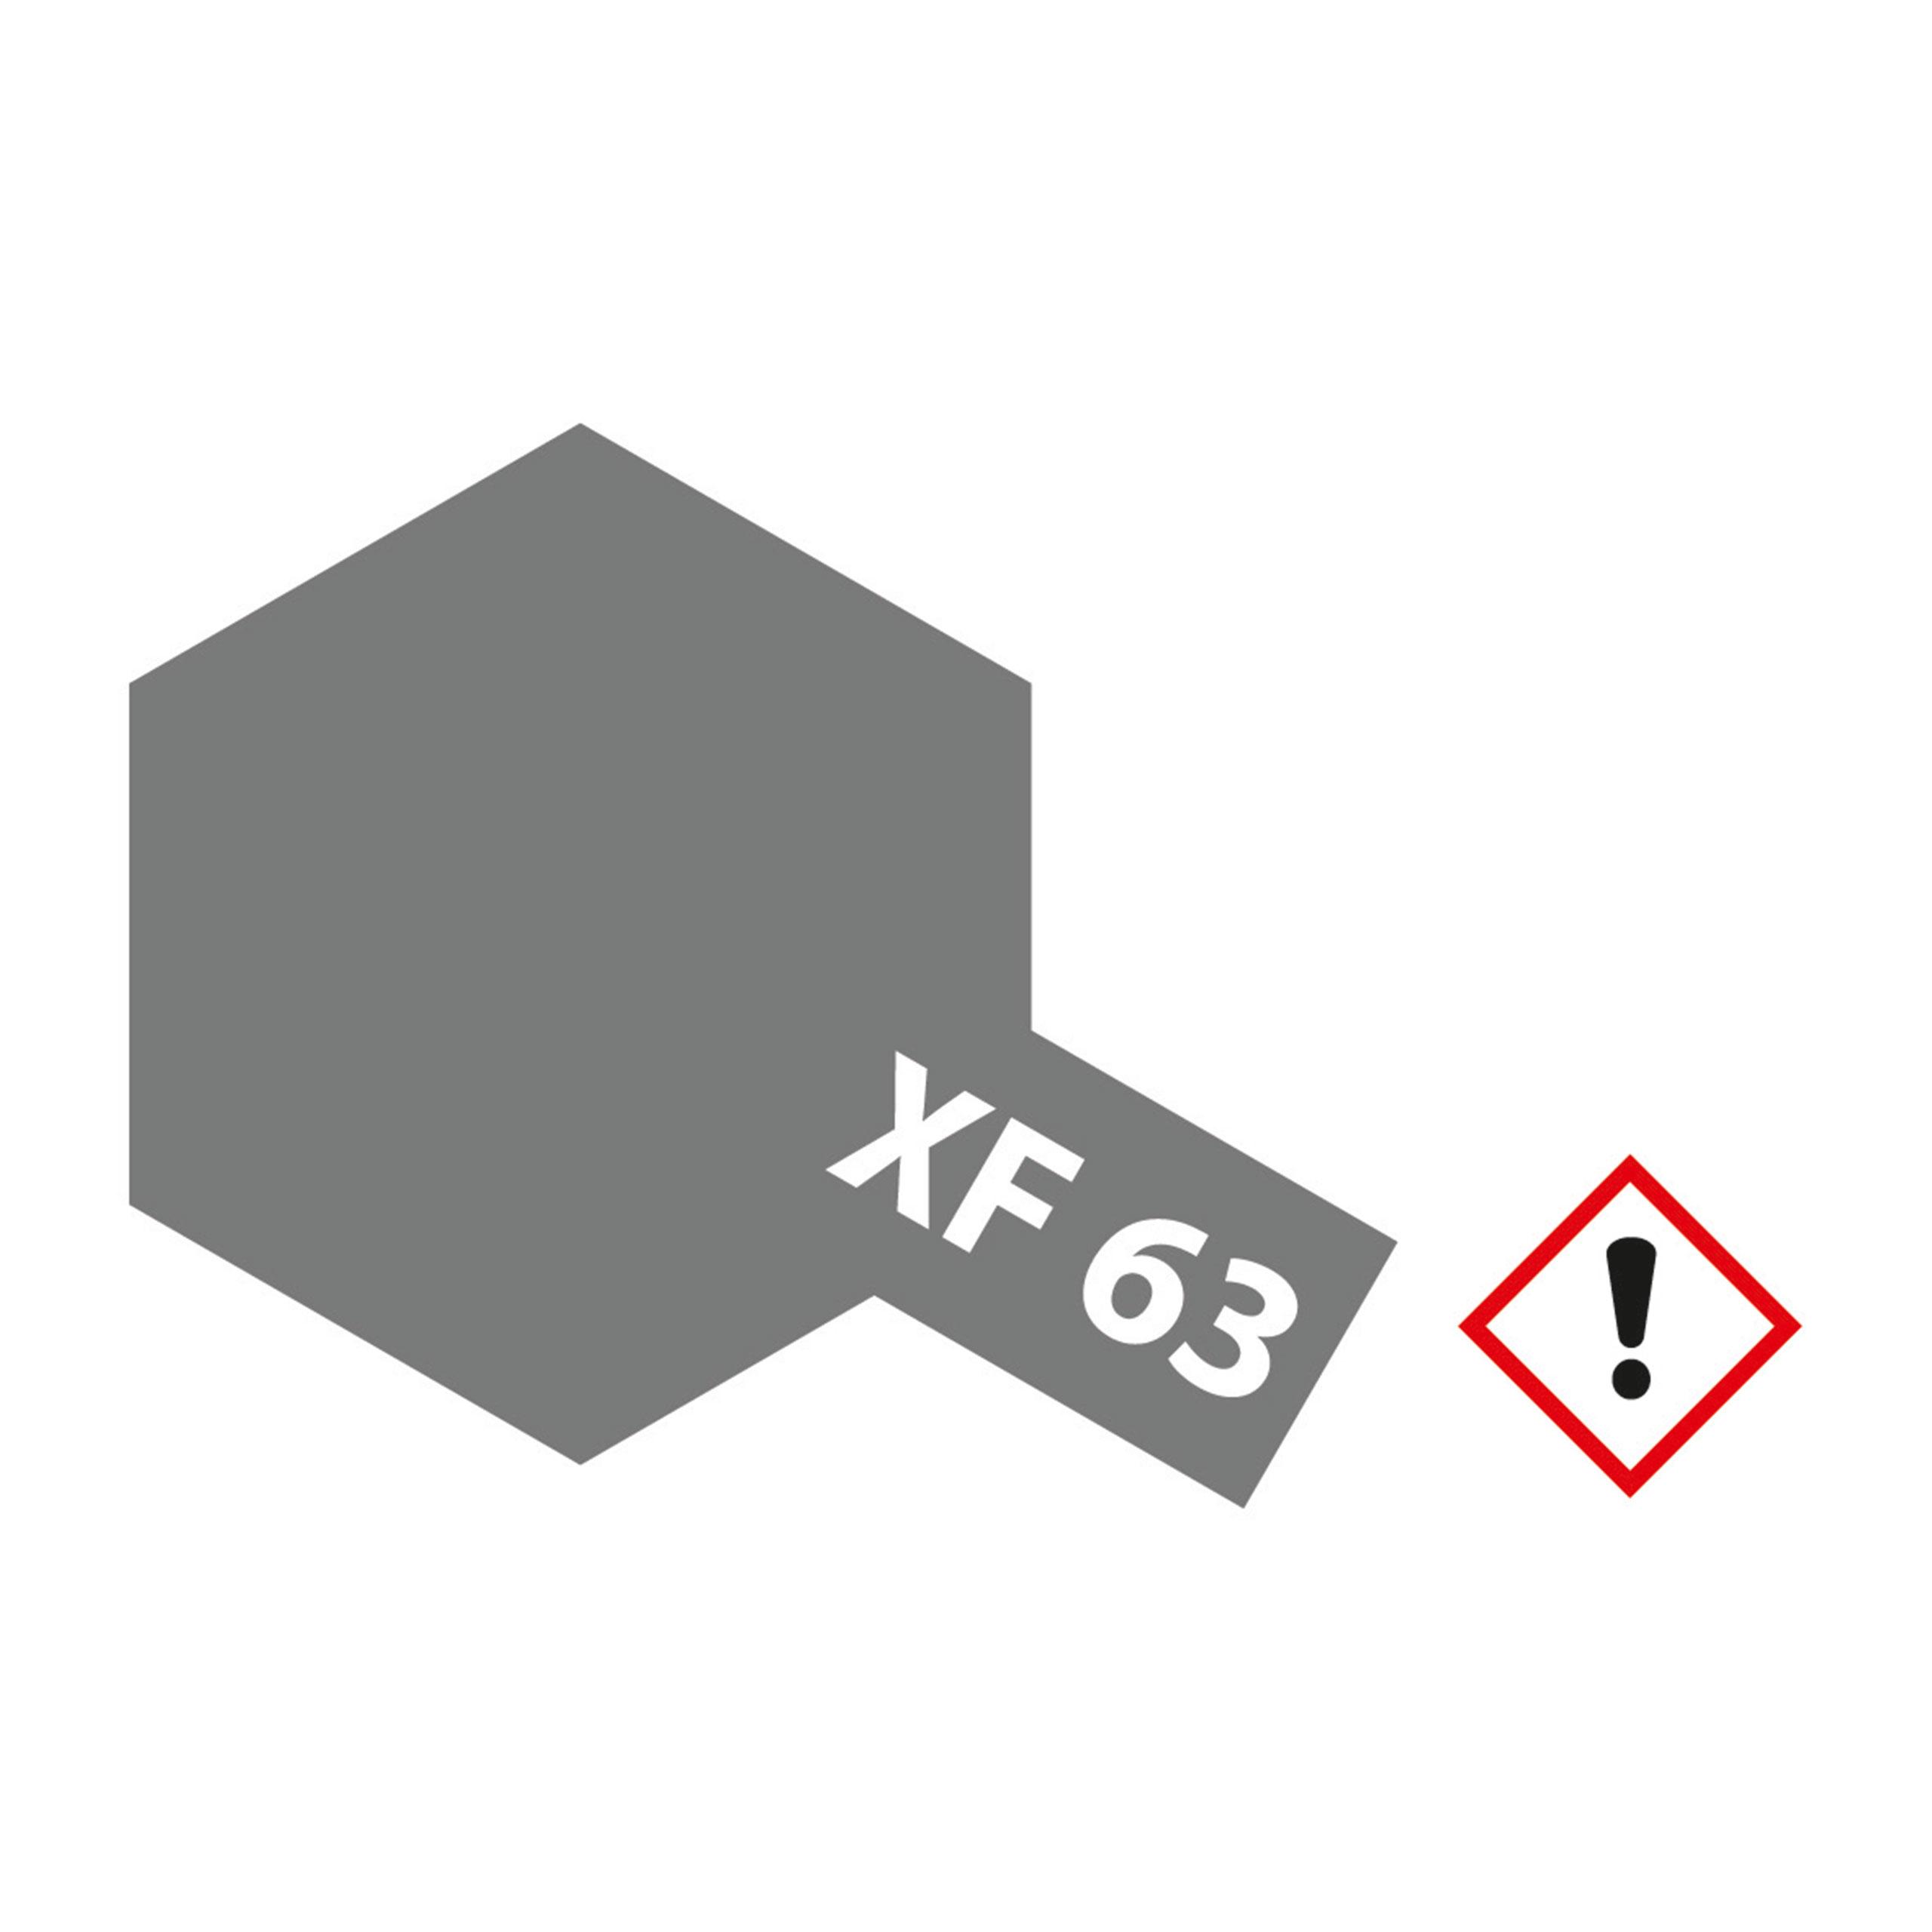 XF-63 German Grau matt - 23ml Acrylstreichfarbe wasserloeslich Tamiya 300081363